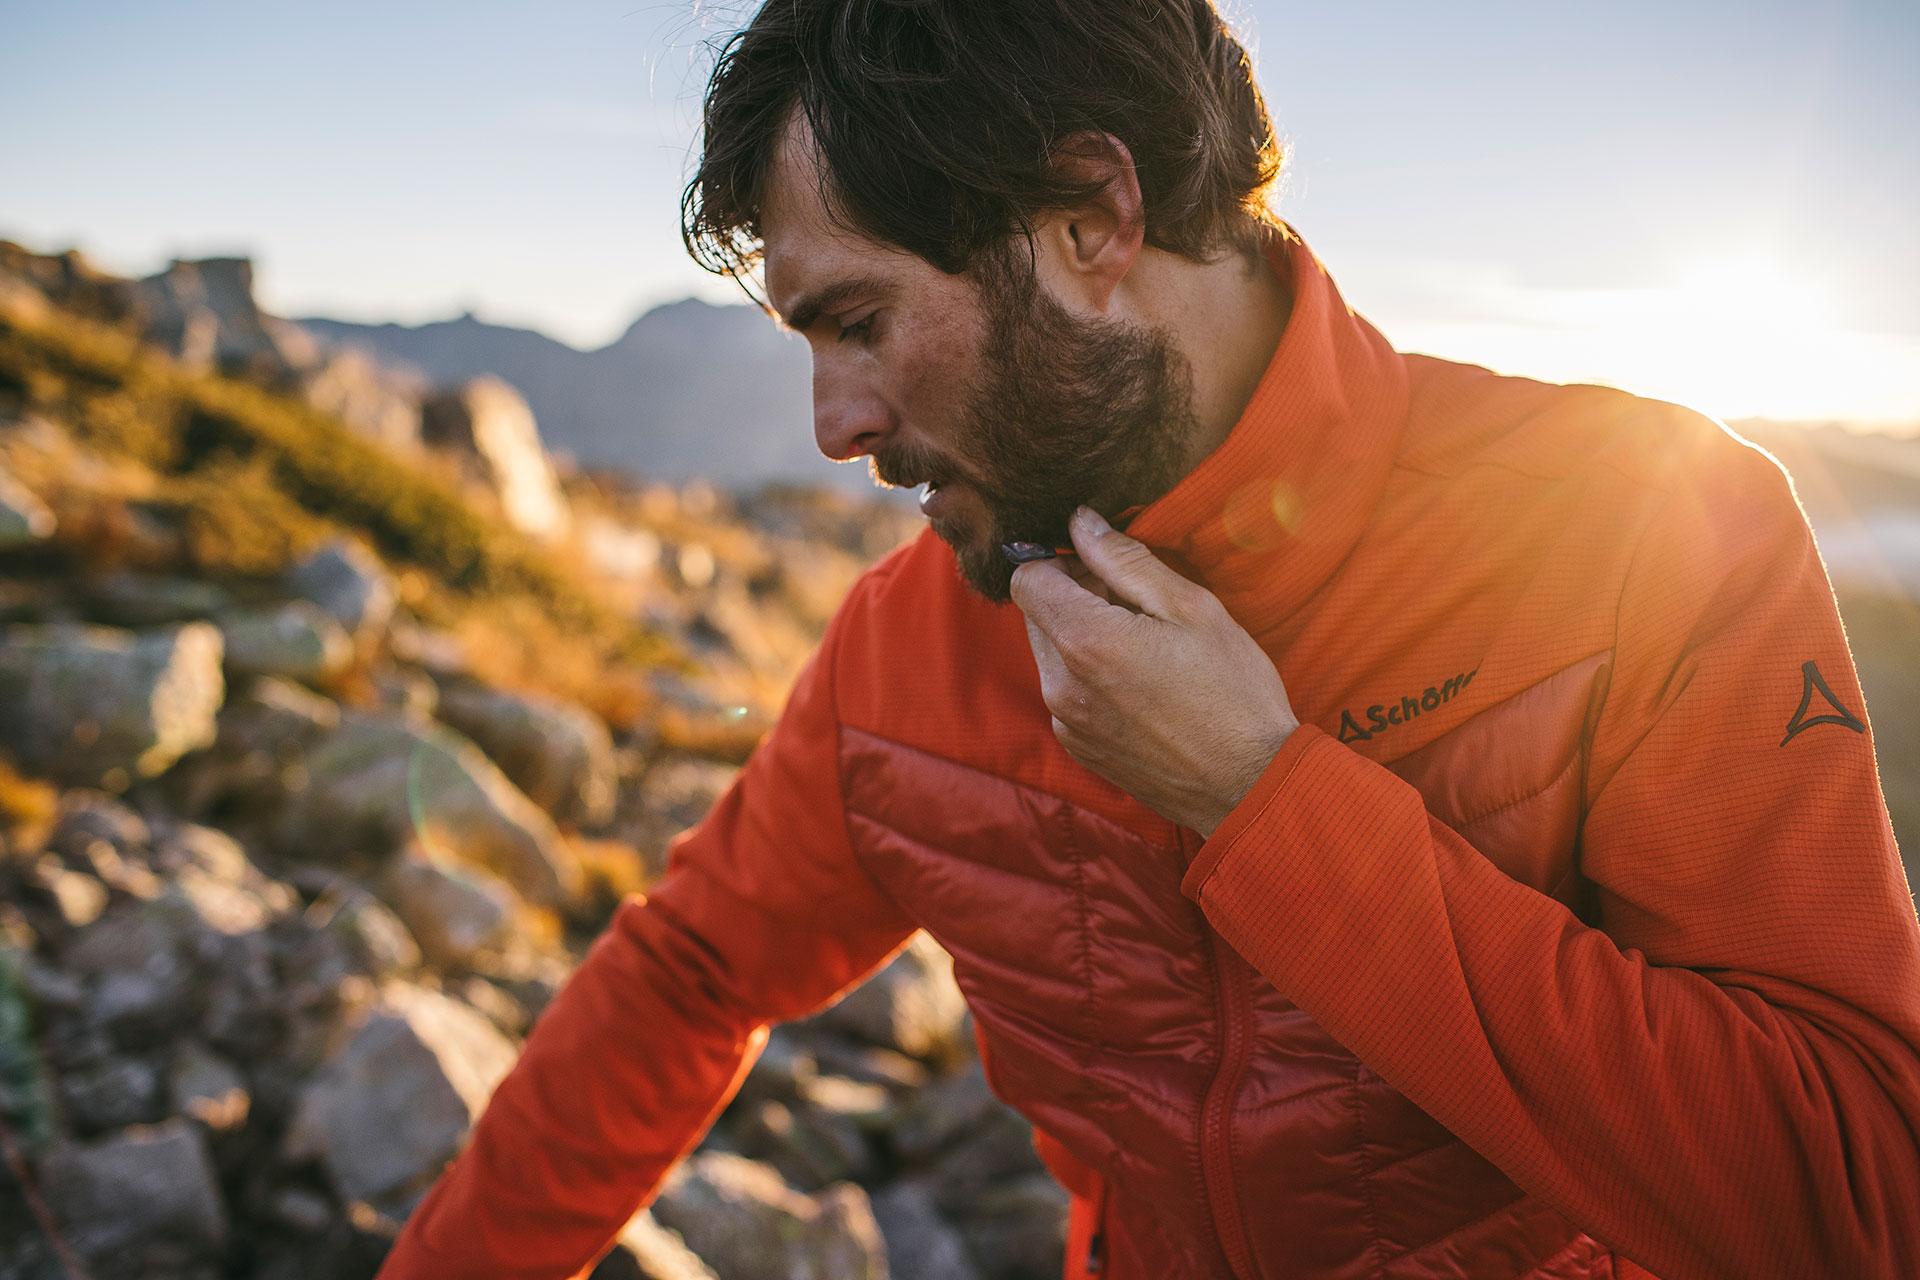 Bergsport Wandern Klettern Sportklamotten Bekleidung London England Fotograf